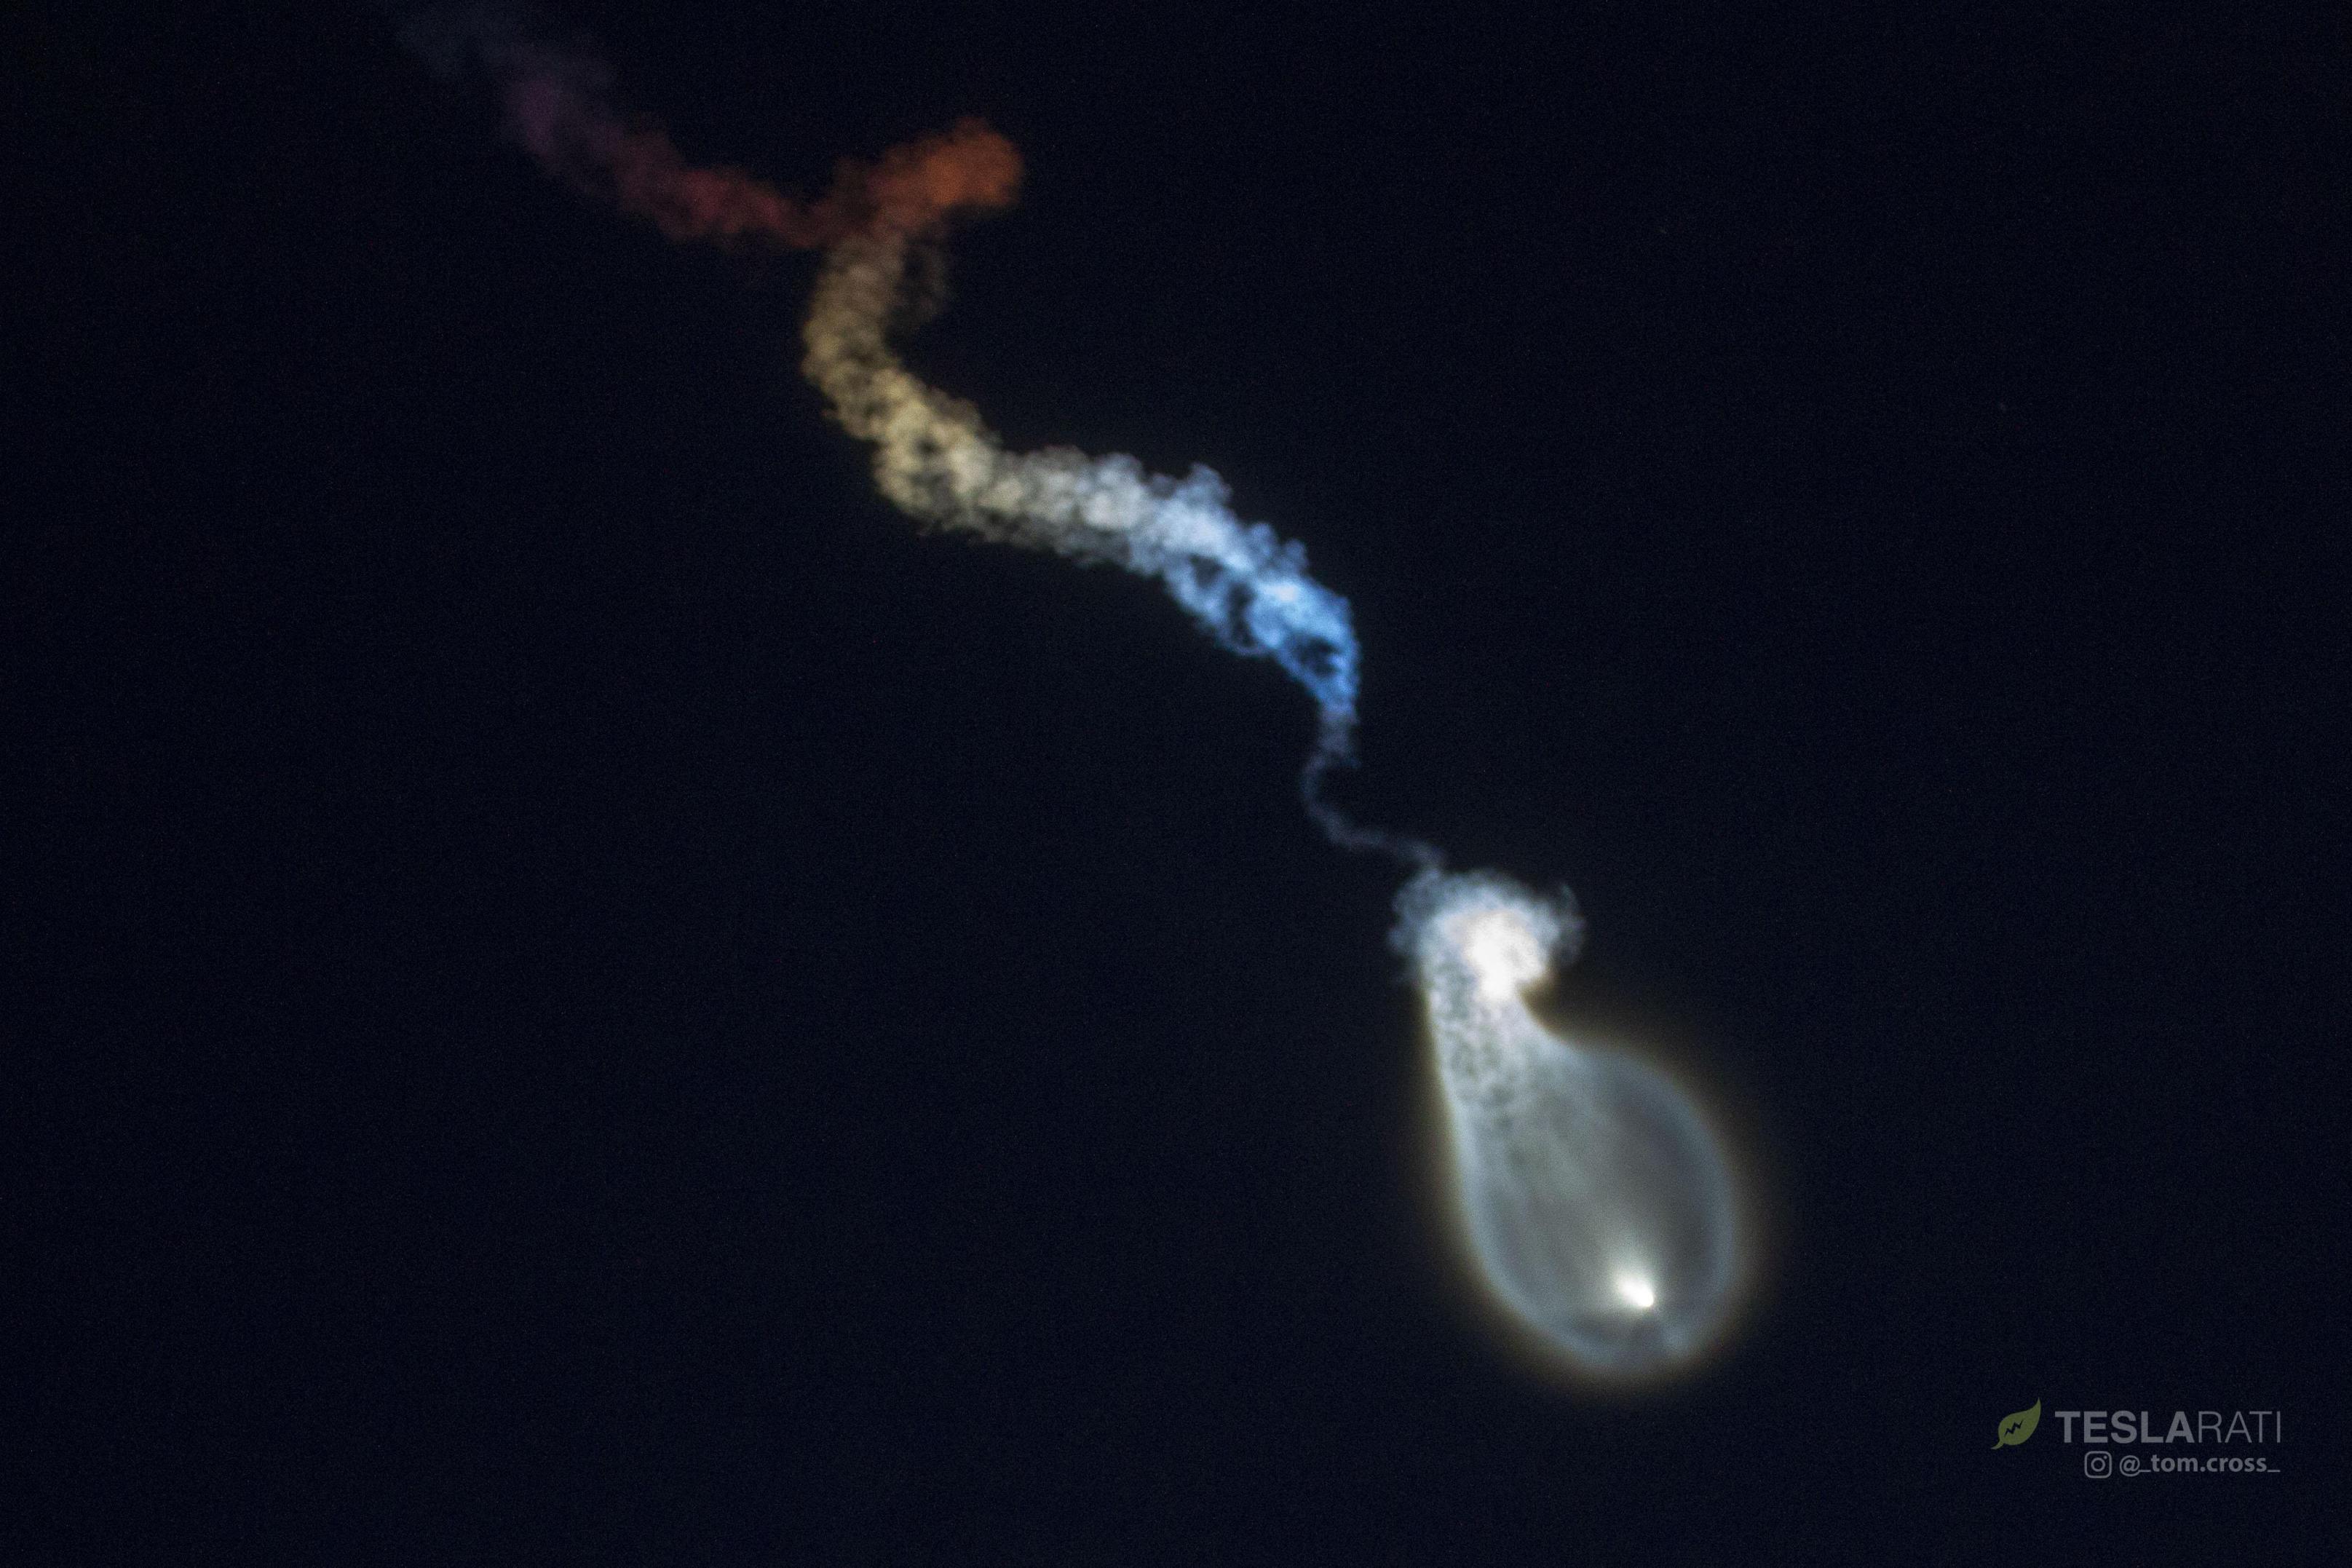 CRS-15 launch plume (Tom Cross) 2(c)